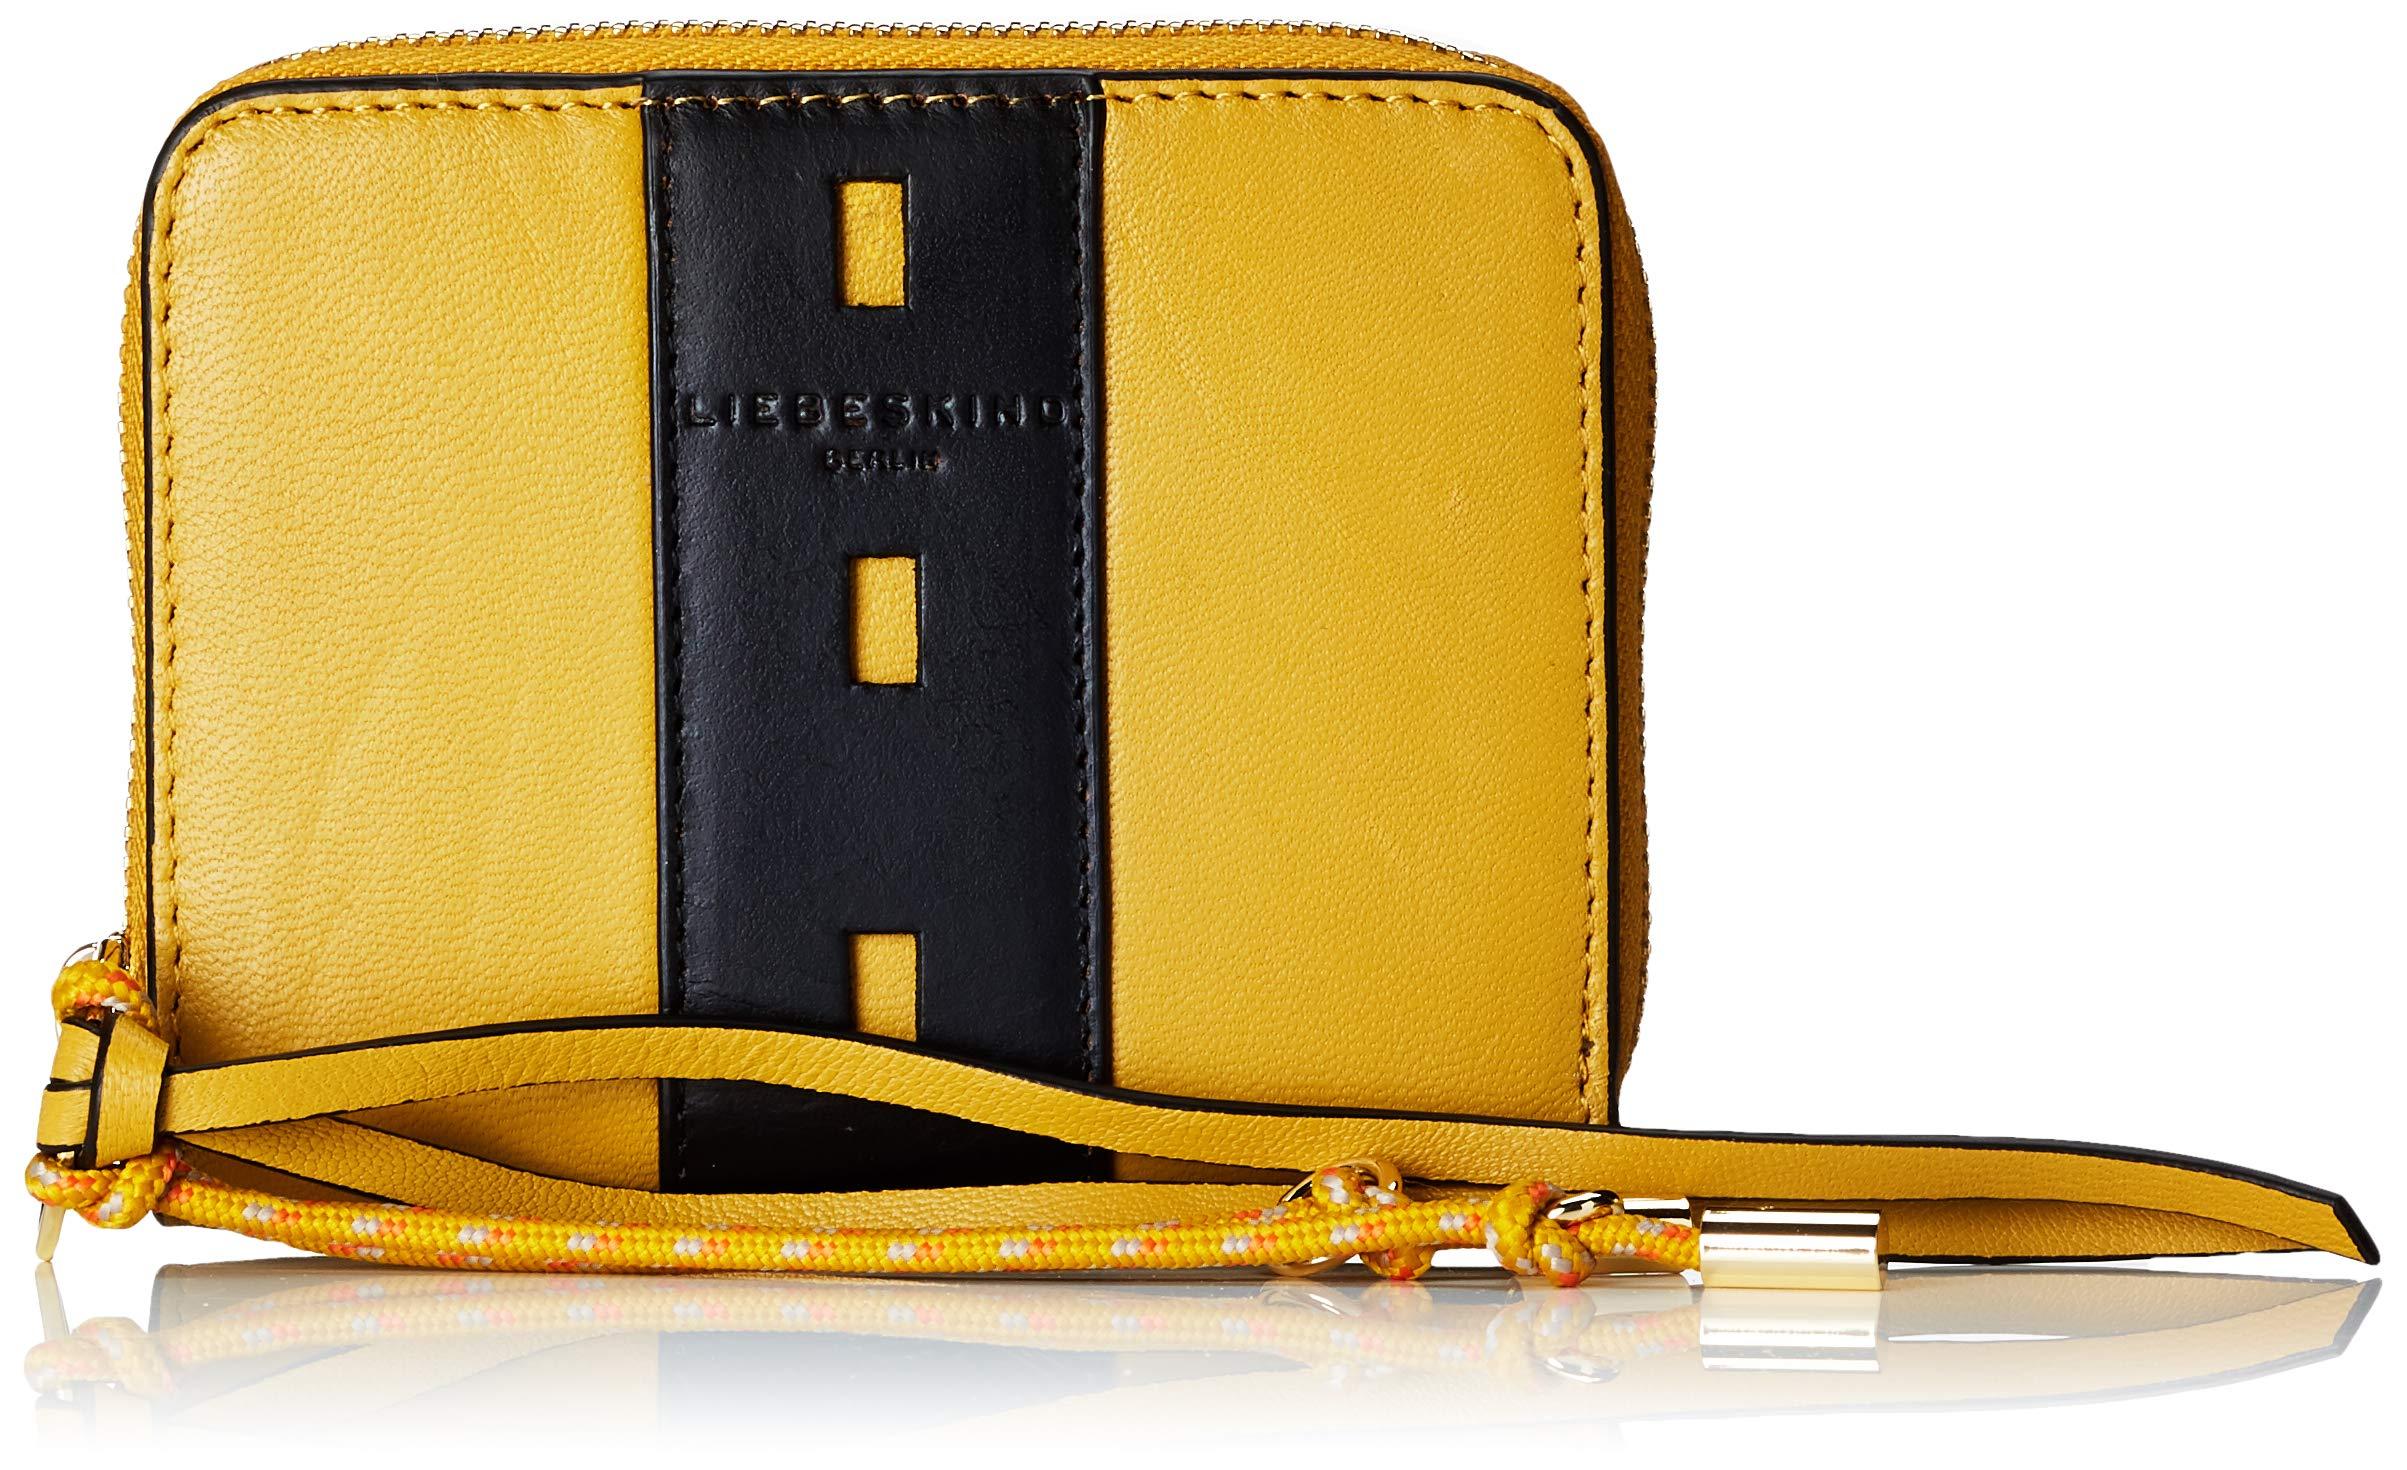 Yellow2x10x13 Dive Cmw H Bag Conny FemmeJaunetawny X Berlin MediumPortefeuilles Liebeskind Wallet L JFT3uK1cl5